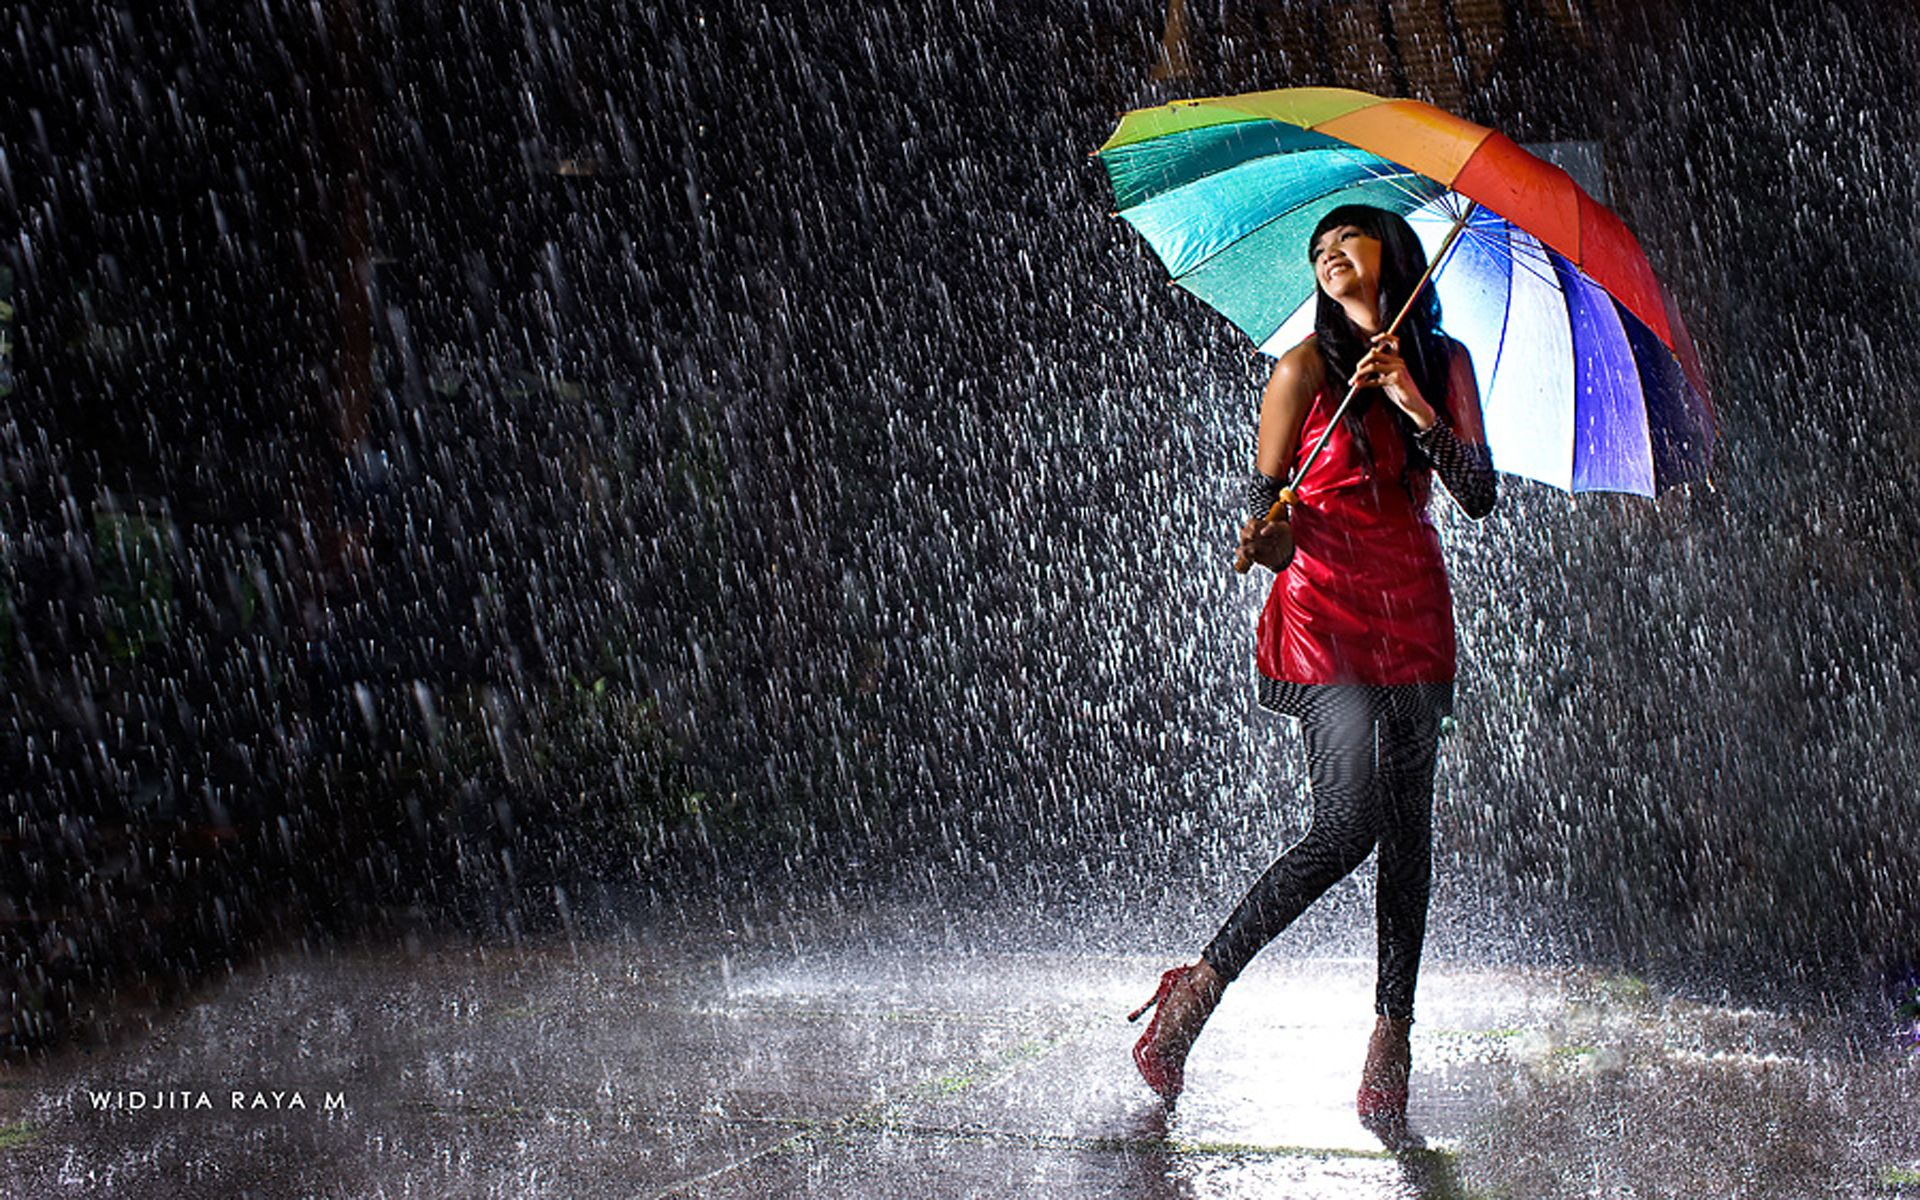 Umbrella Wallpapers Photos And Desktop Backgrounds Up To